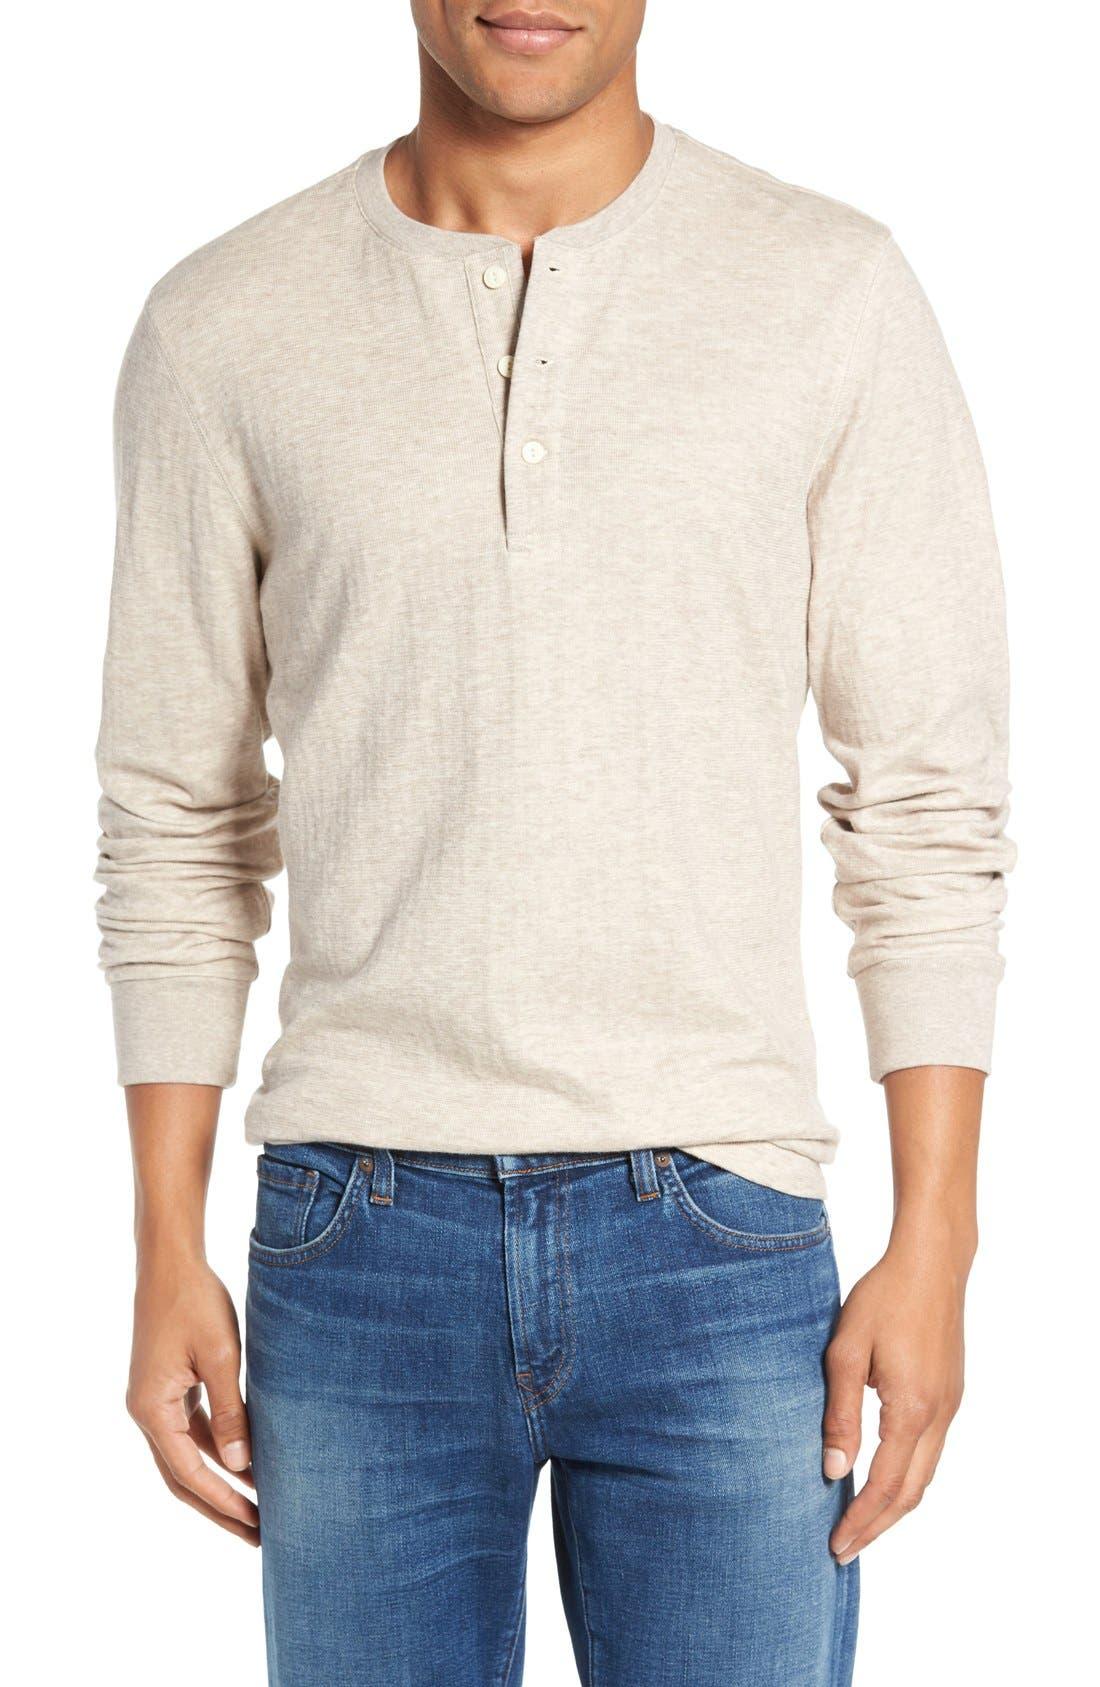 Main Image - Nordstrom Men's Shop Long Sleeve Henley